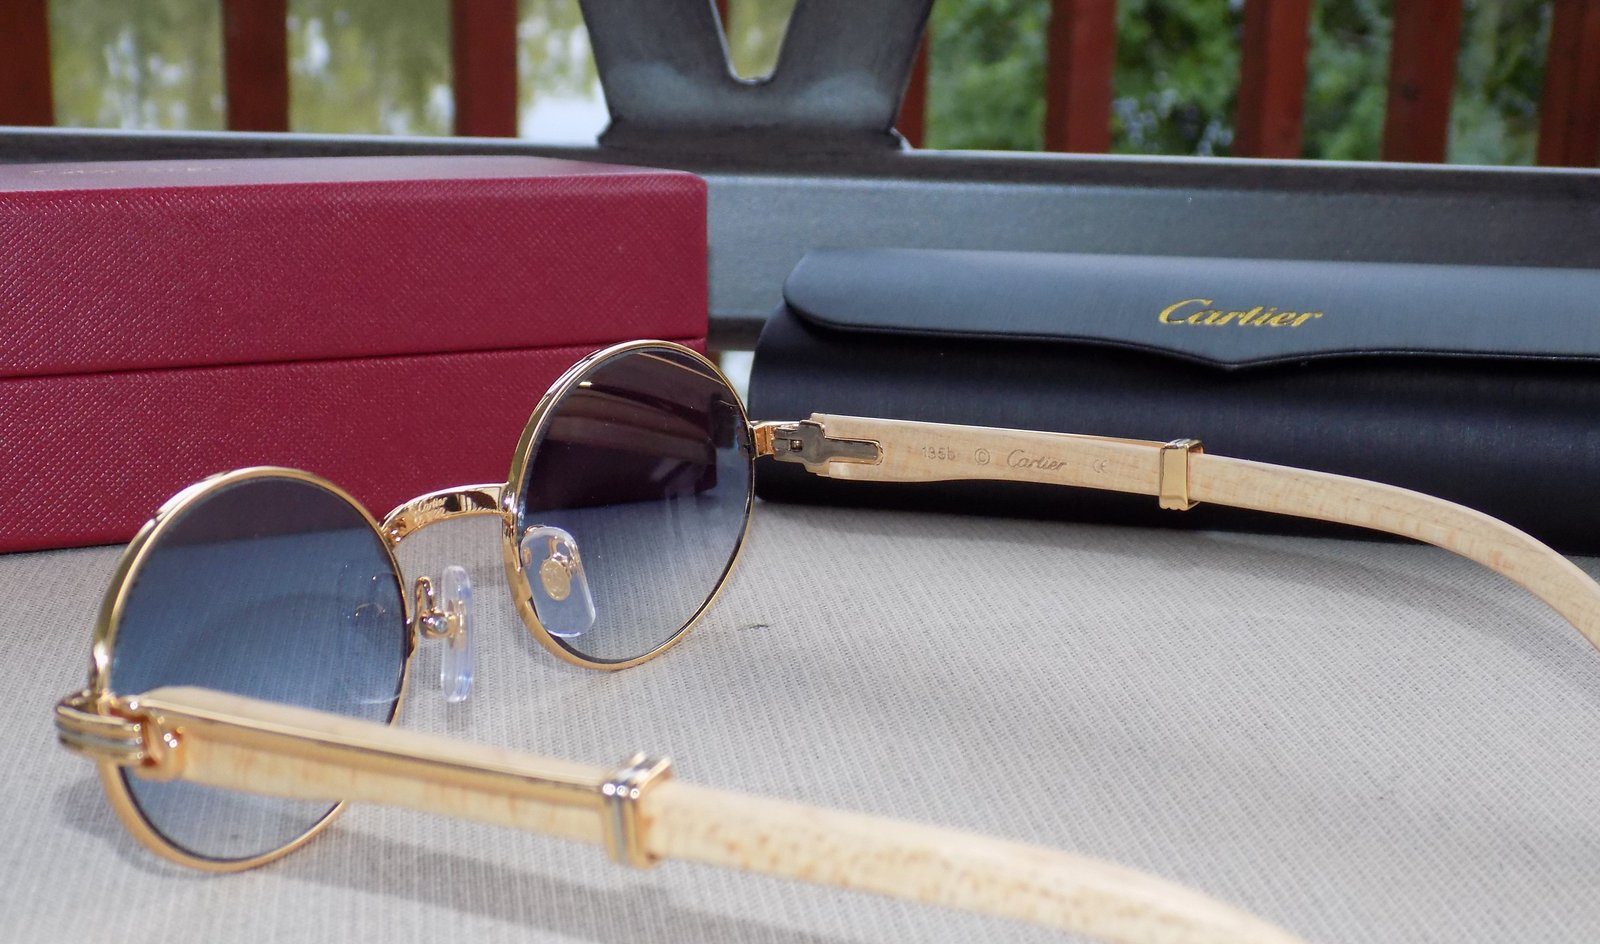 e7a0bac2162c Cartier Smooth Tulip Whitewood Blue Lens Buffalo C Décor Sunglasses